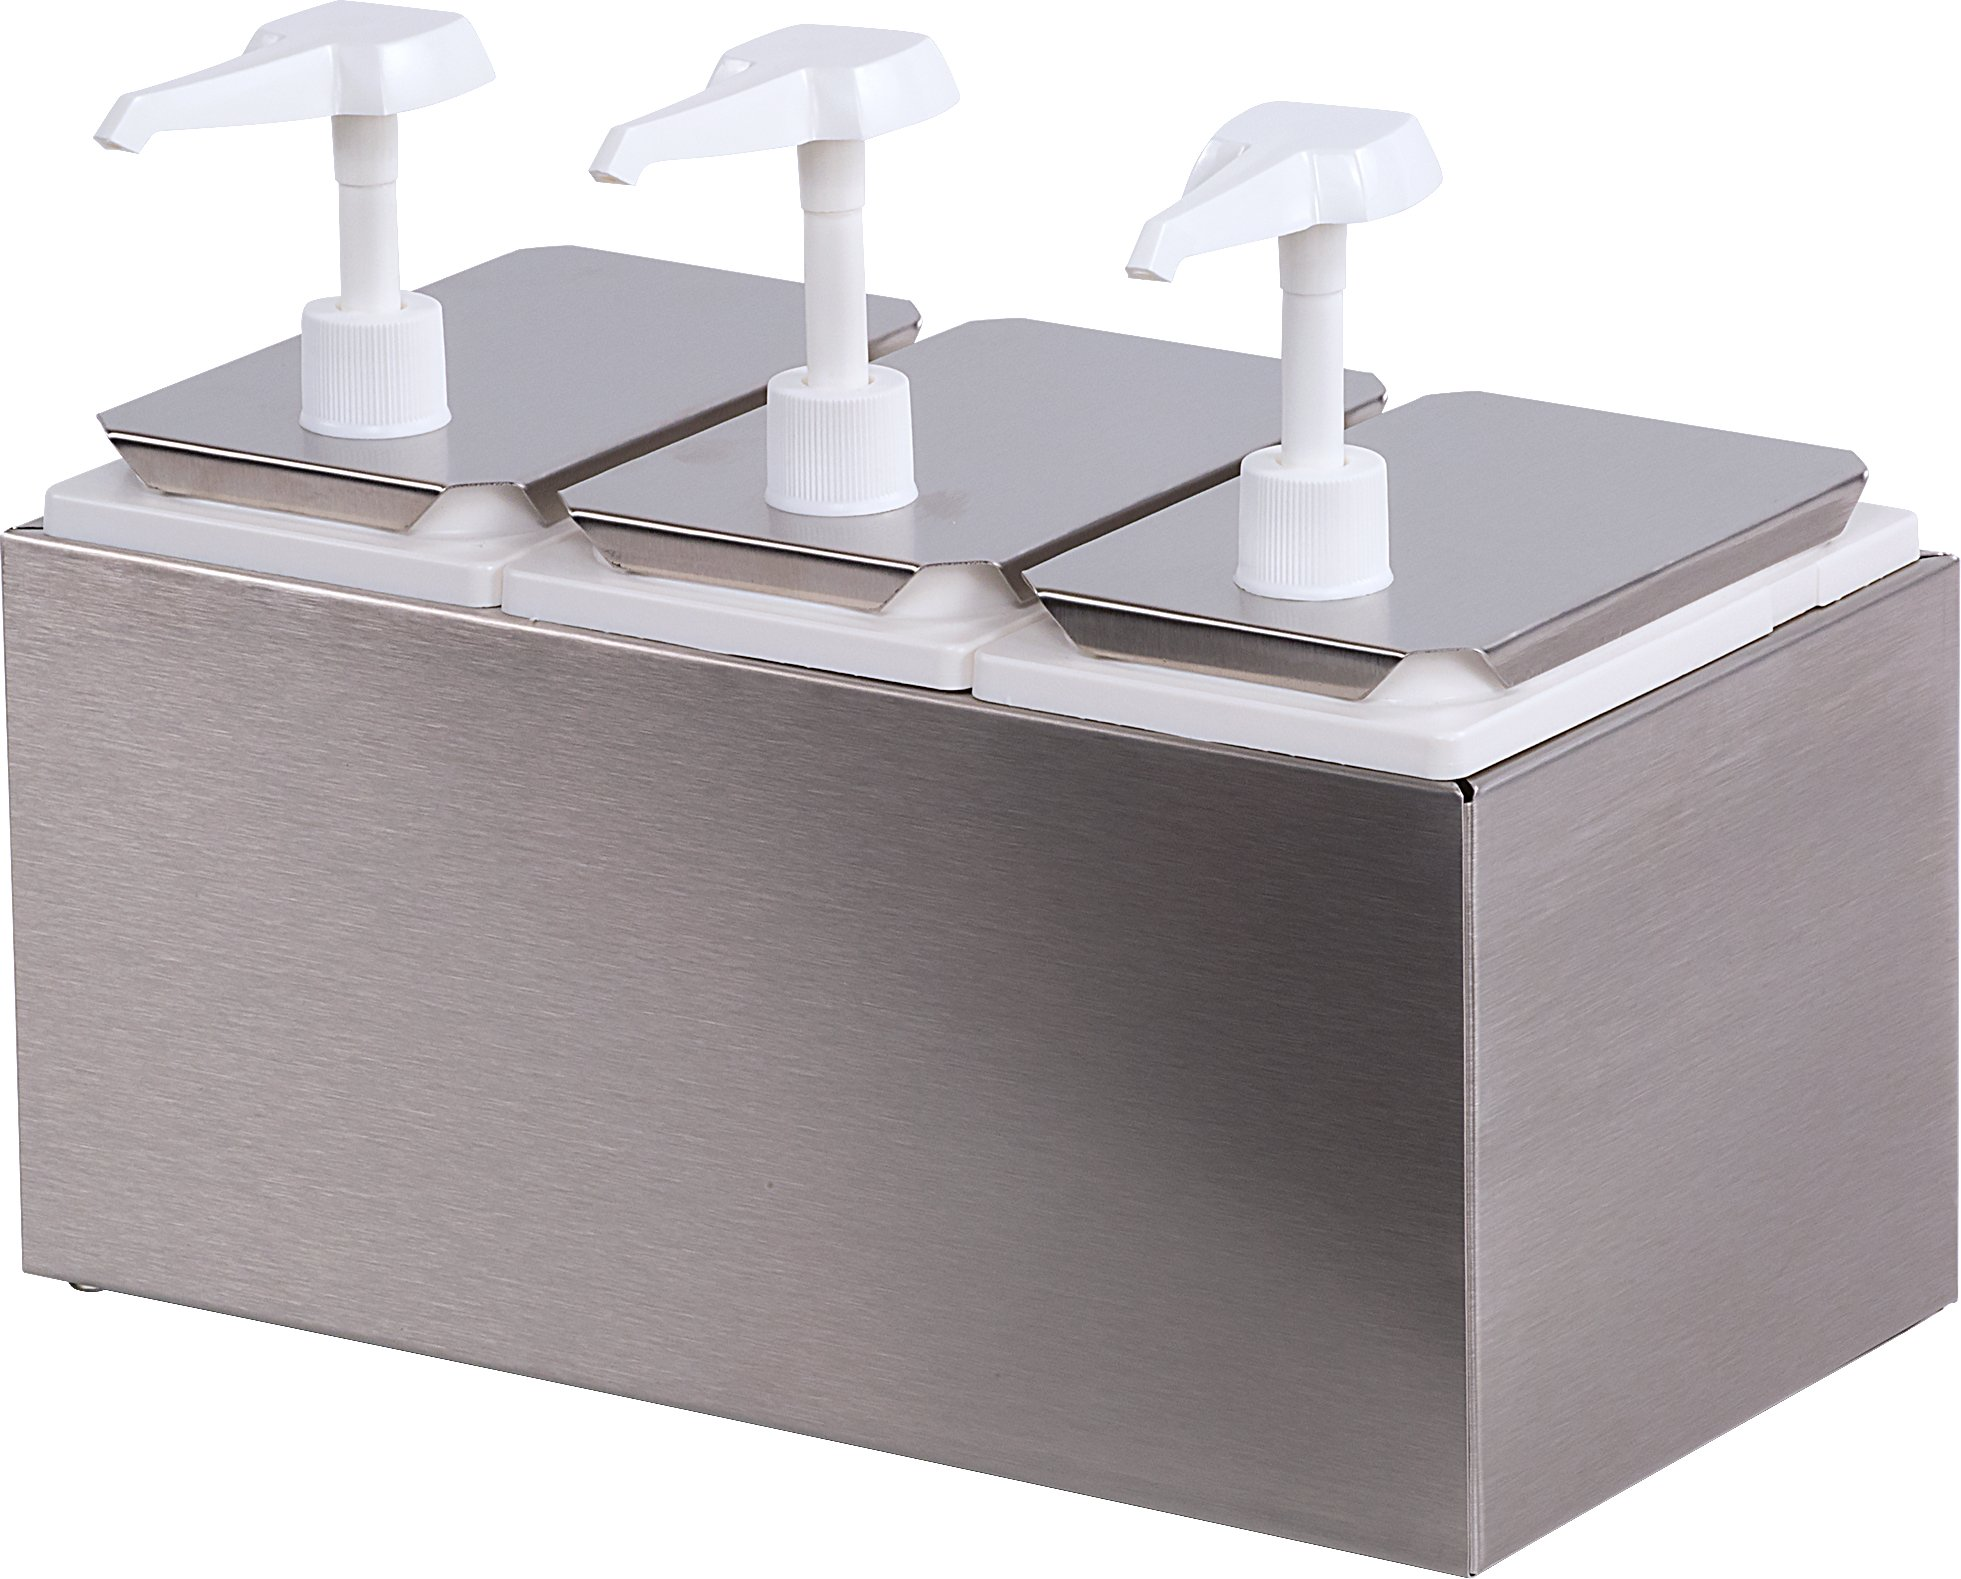 Carlisle 38503 Tripple Condiment Pump Station with 2.5 Quart Jars by Carlisle